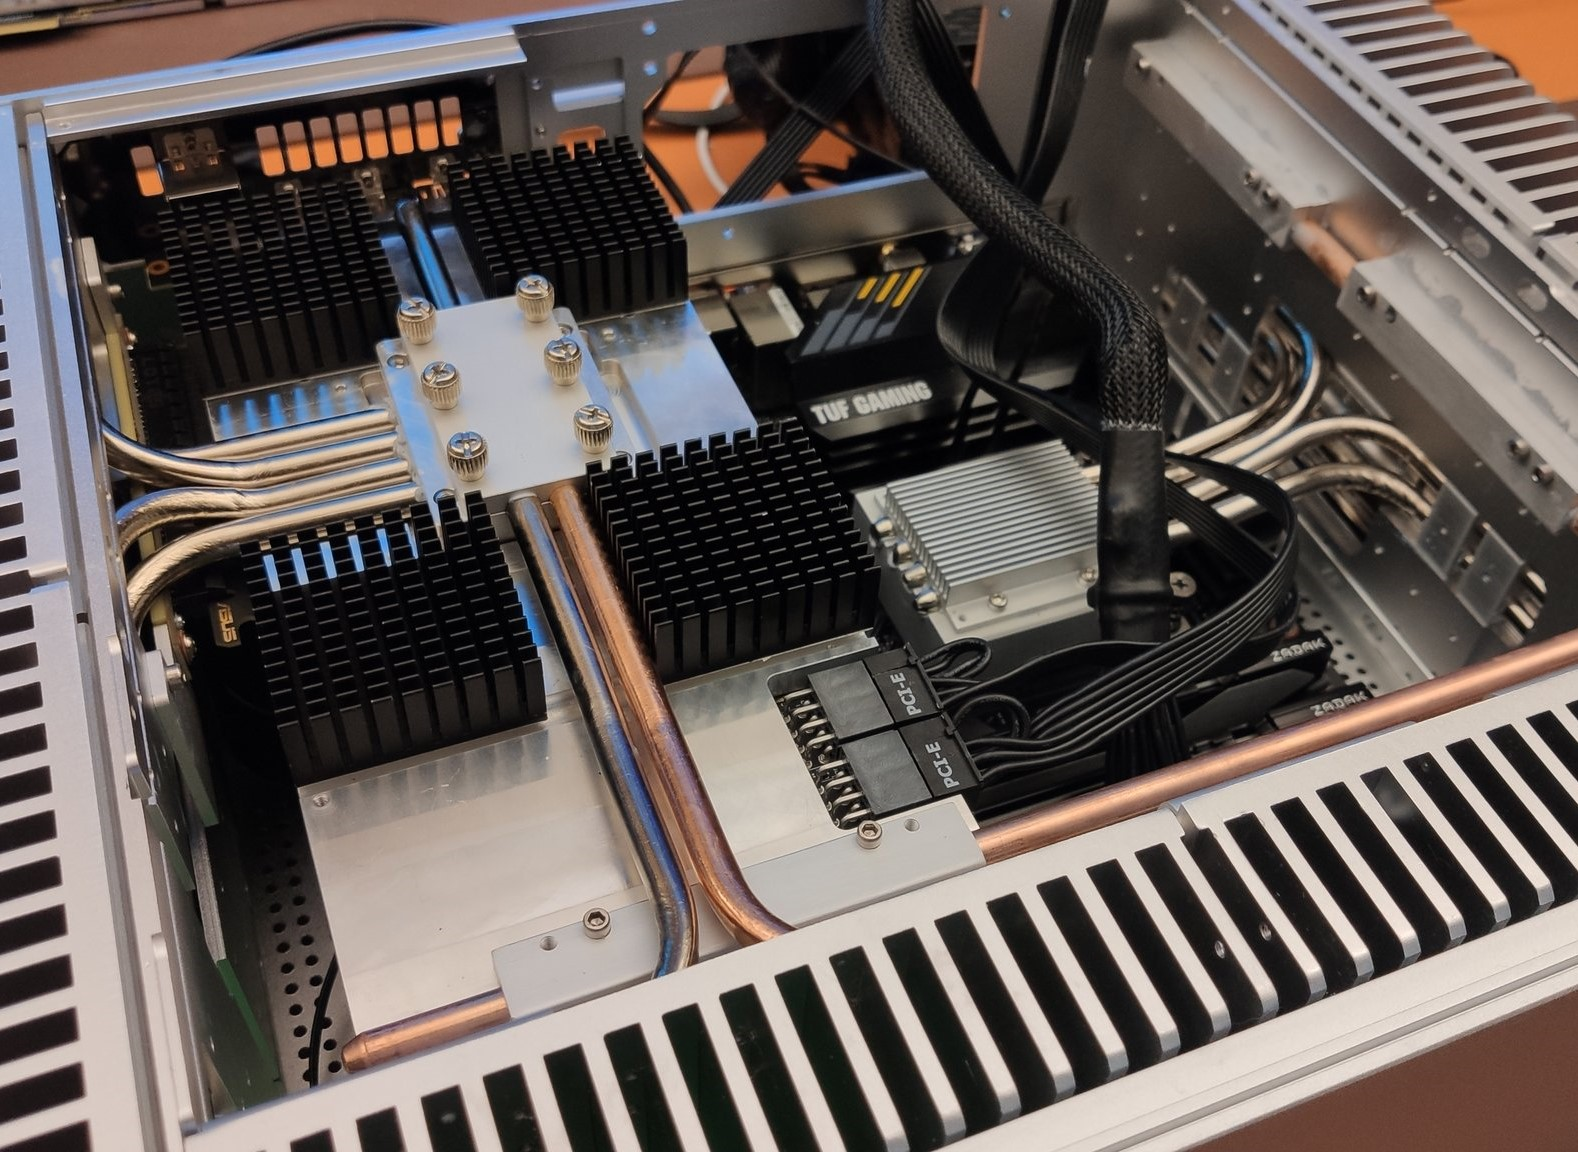 Fanless RTX 3080 spotted inside a silent mini PC build - Notebookcheck.net